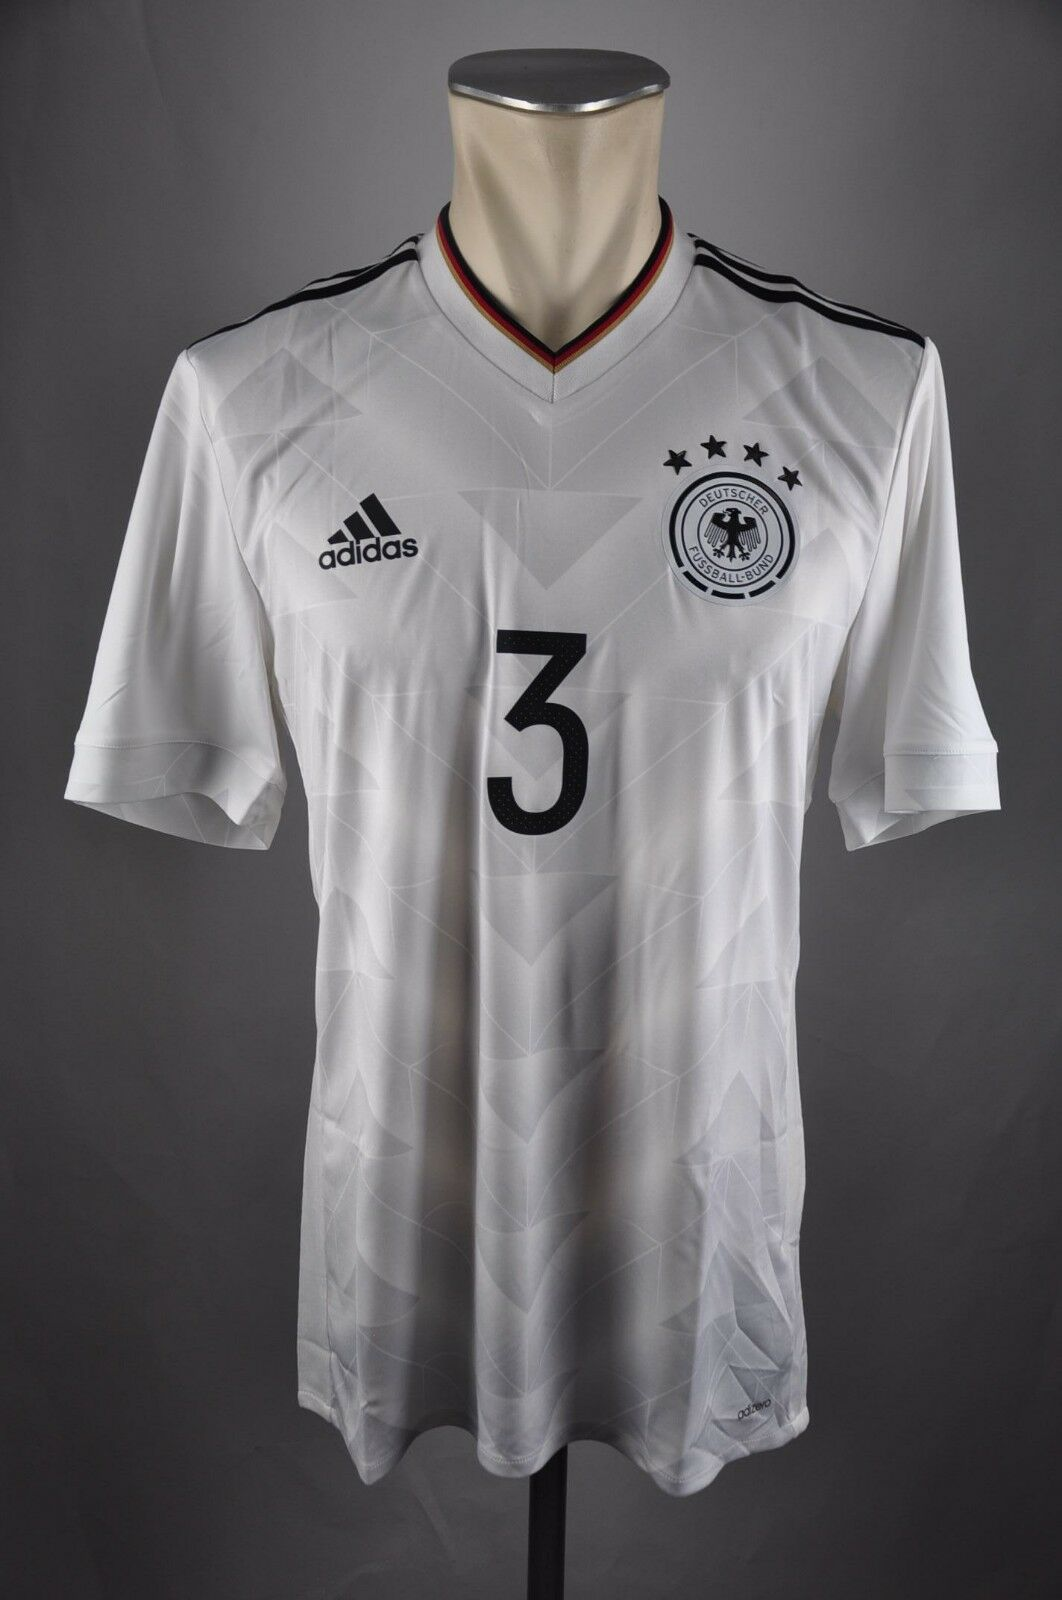 Deutschland Trikot Gr. 6 M  3 Adidas adizero 2017 DFB Germany Confed Cup Player